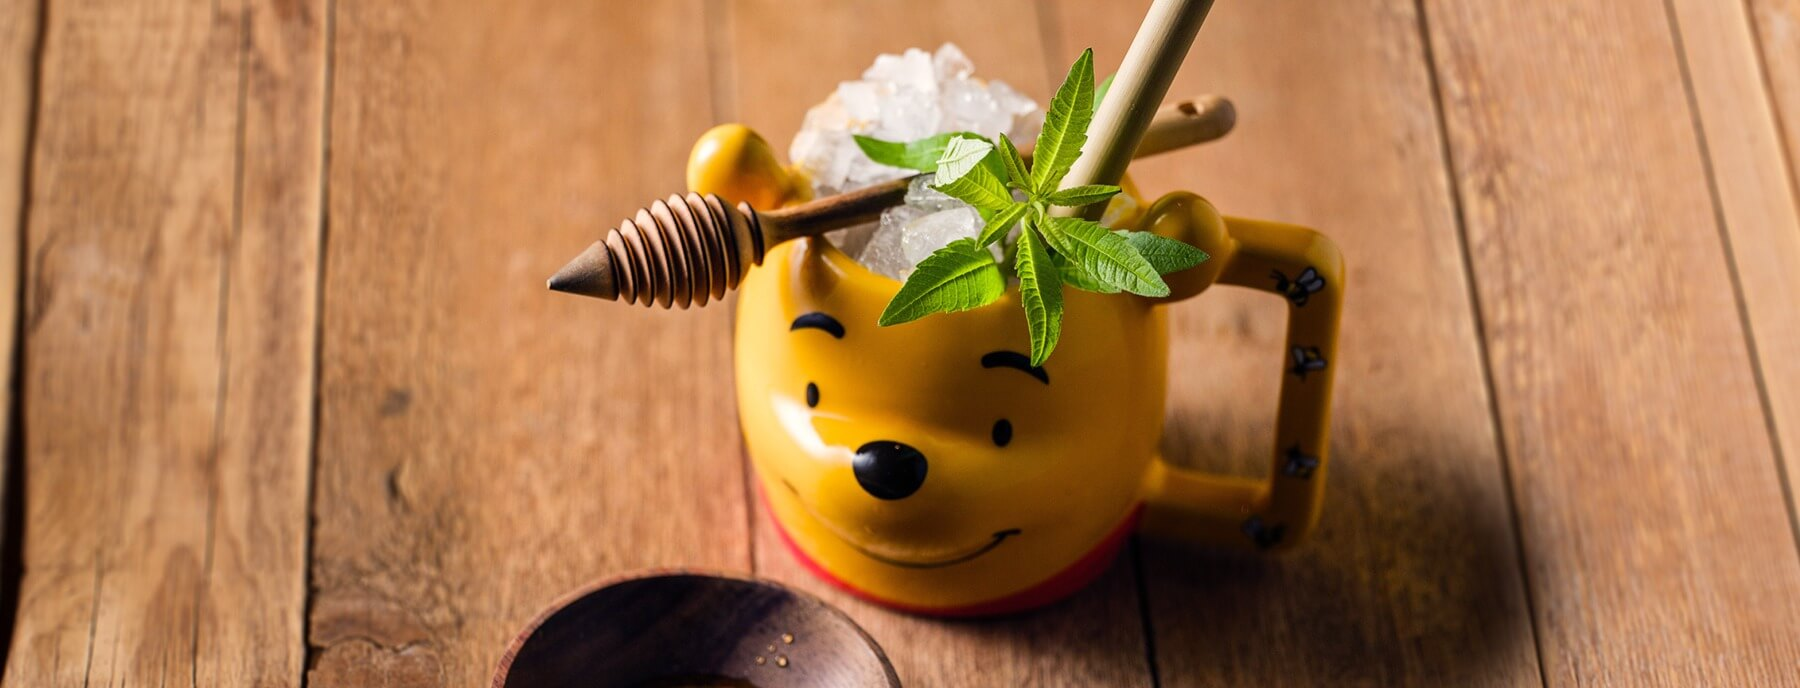 Verfrissende cocktail met citroenverbena